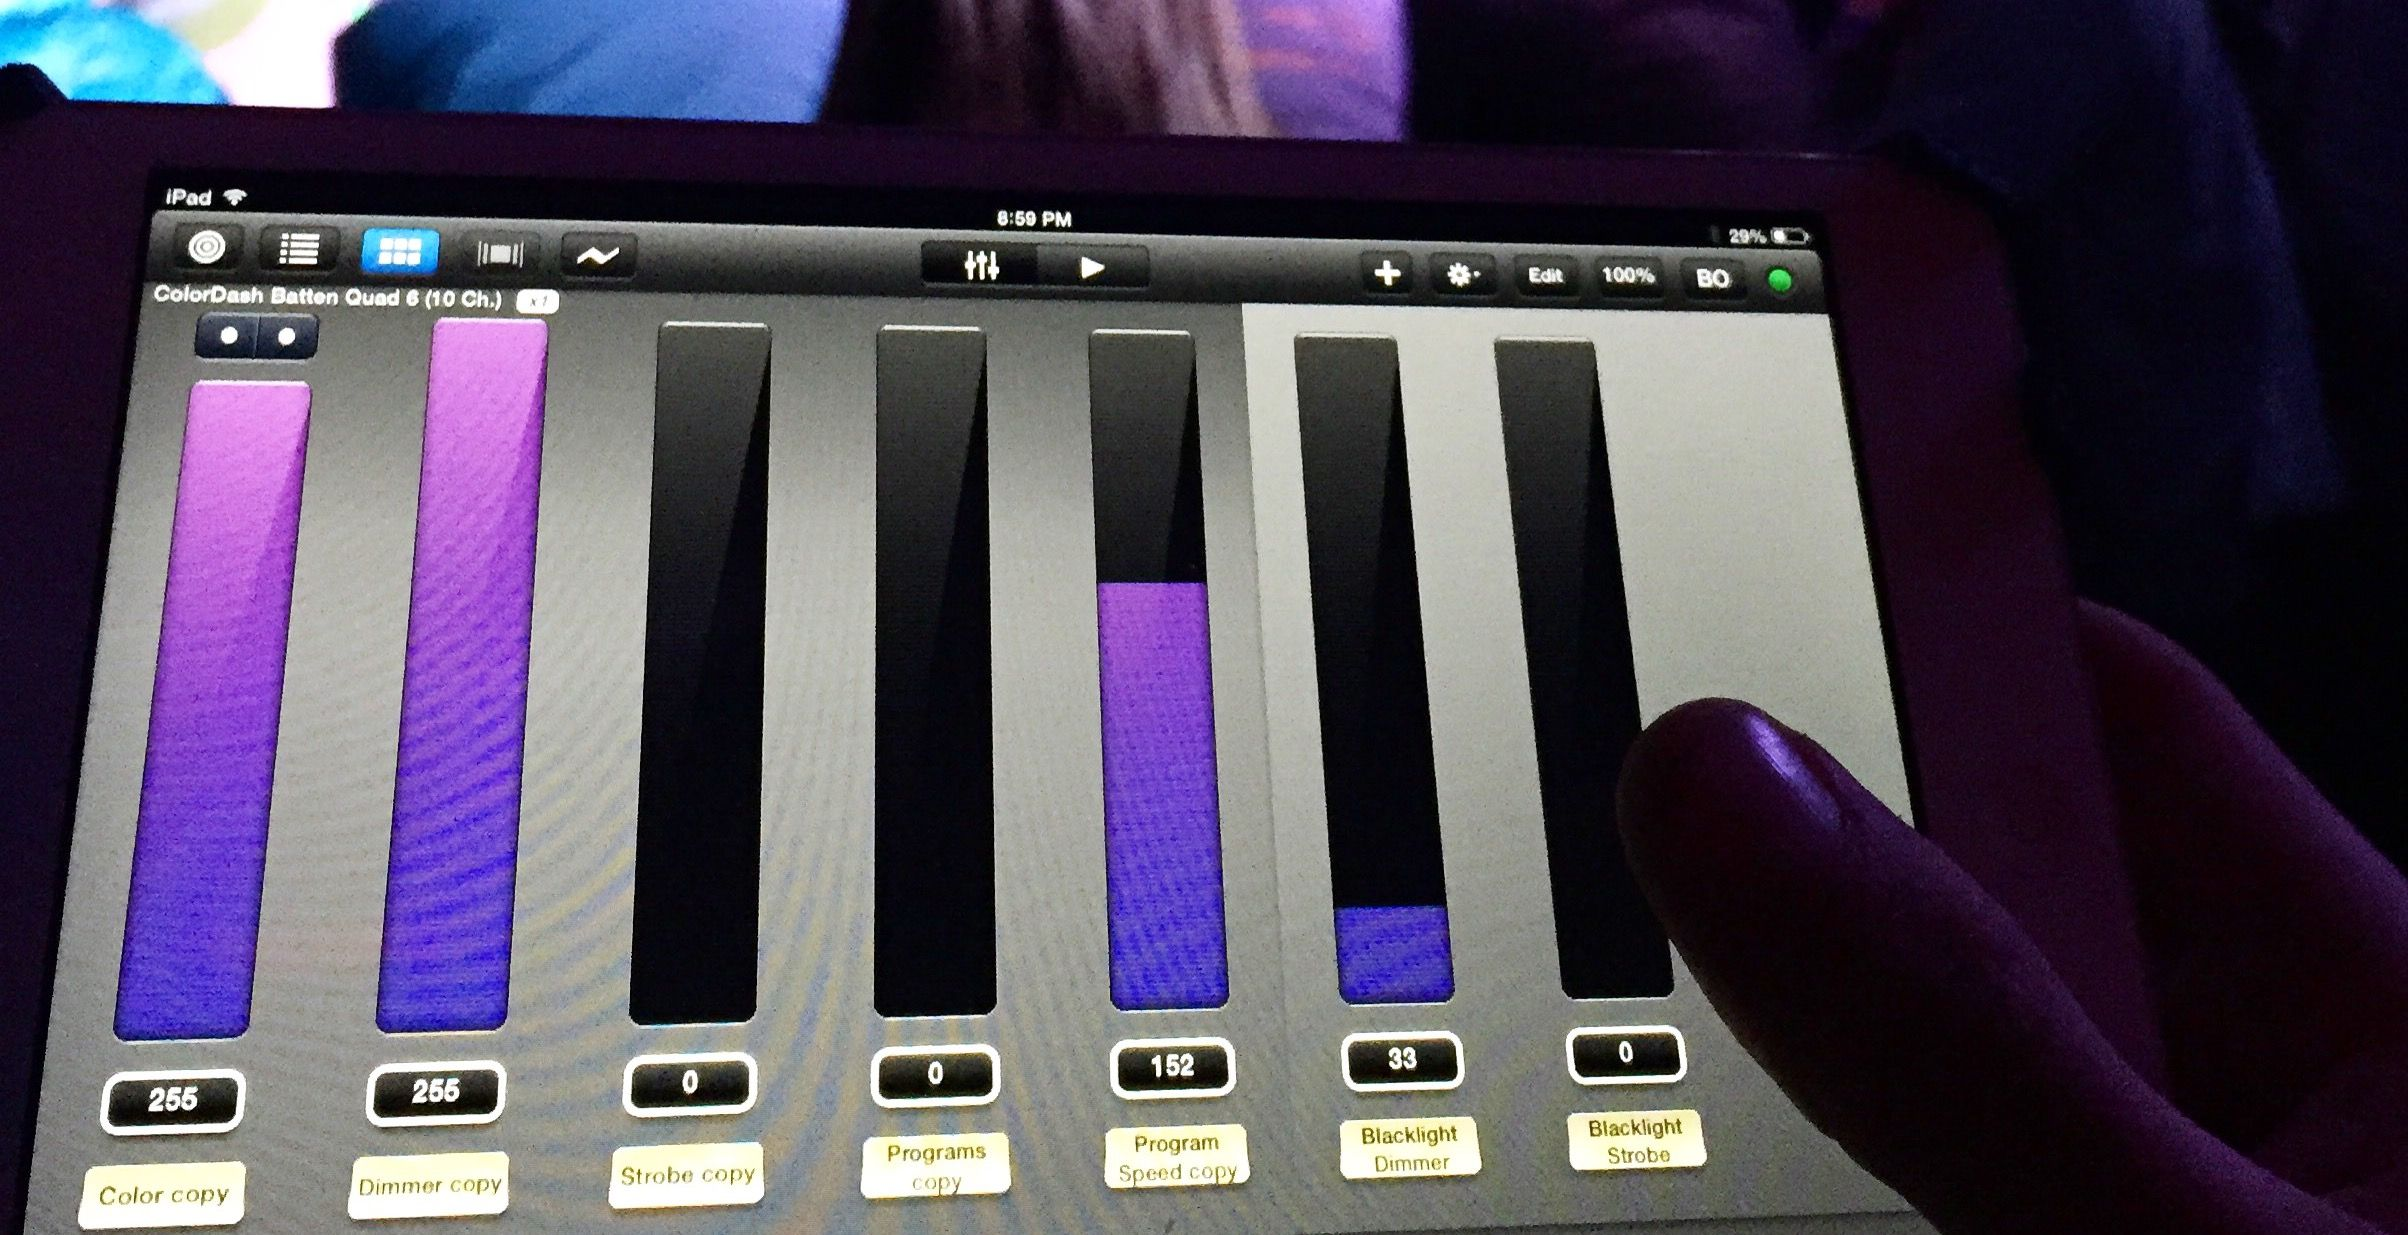 iPad lighting control